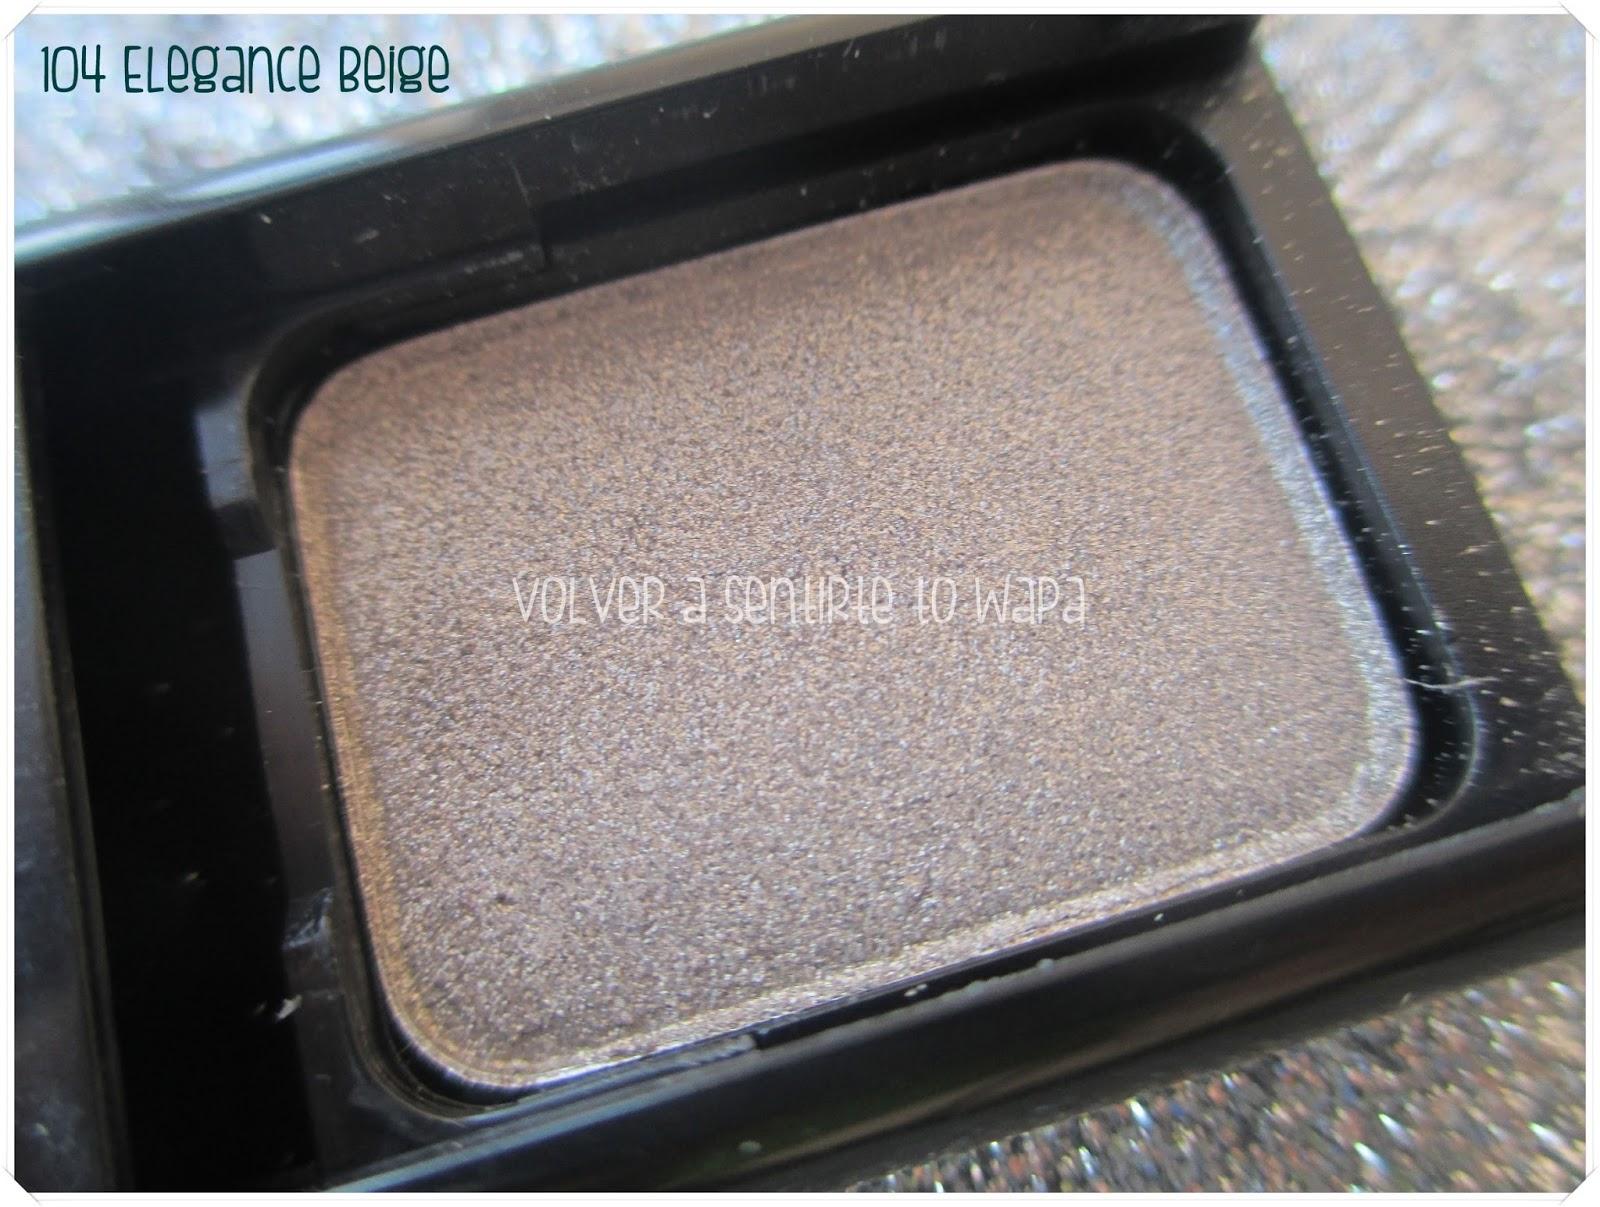 Pierre René - Single Eyeshadow {Review & Swatches & Maquillaje} - Sombra 104 Elegance Beige